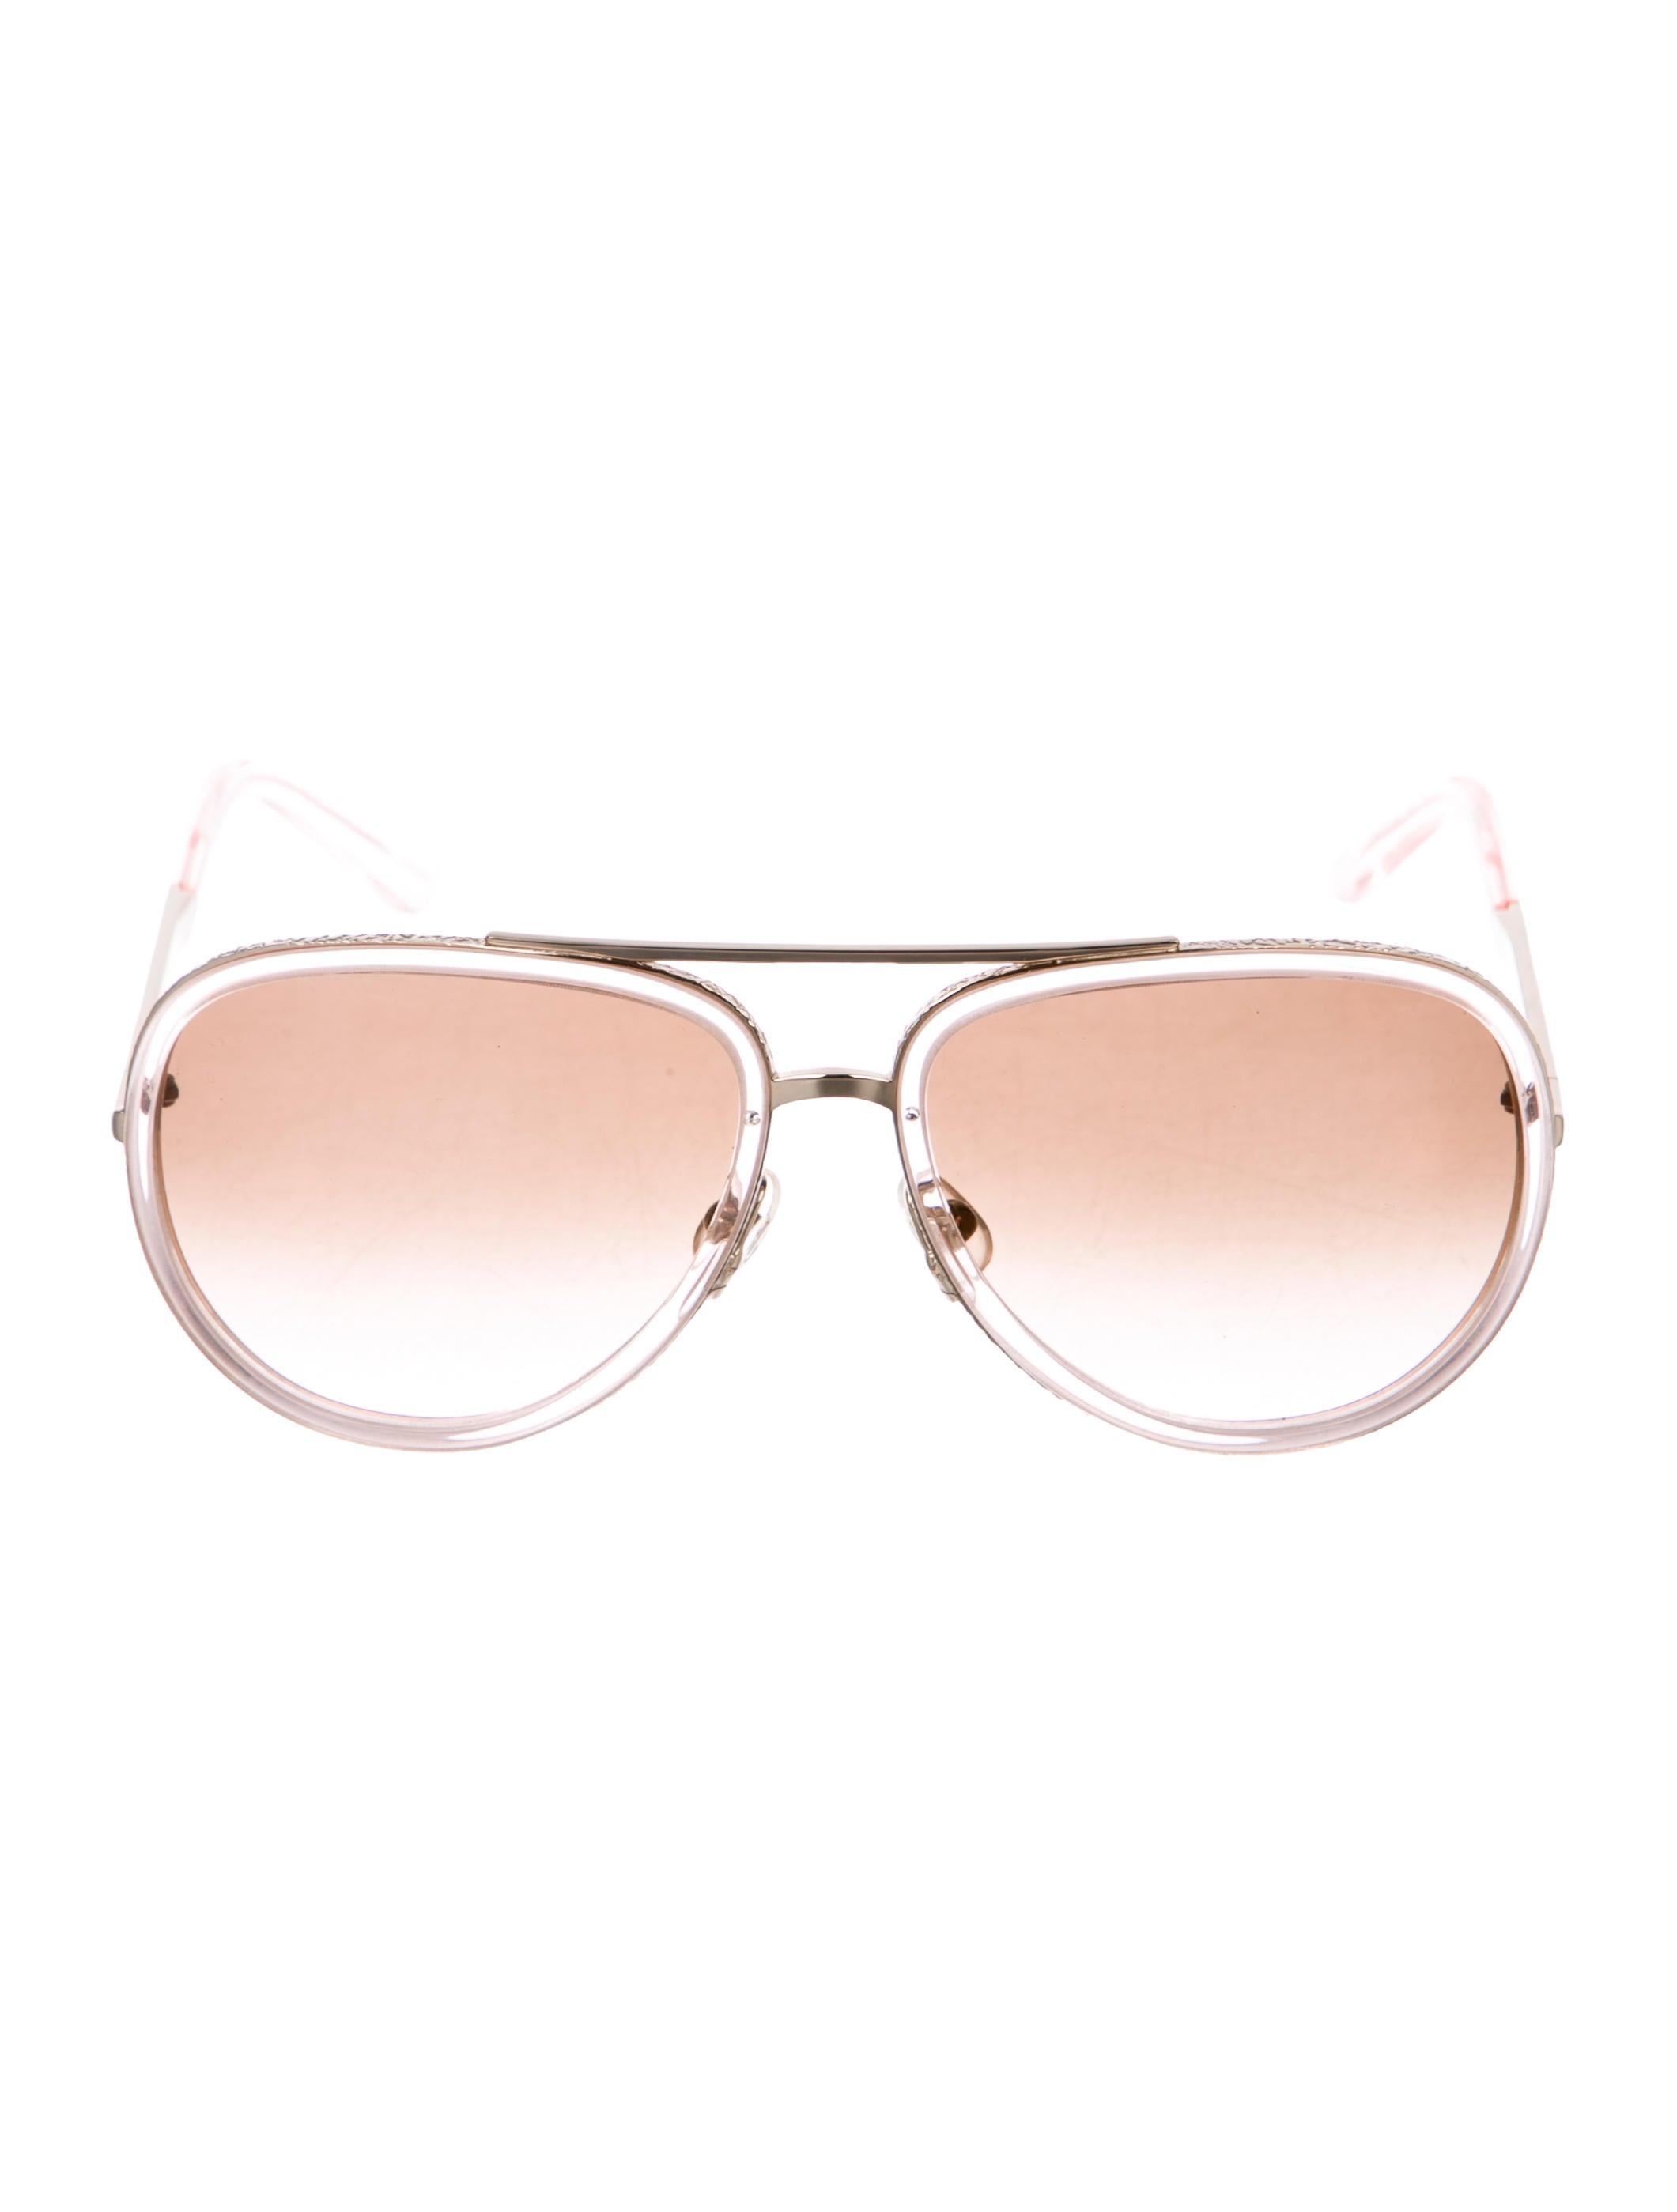 1507a52036 Kate Spade New York Makenzie Aviator Sunglasses - Accessories ...